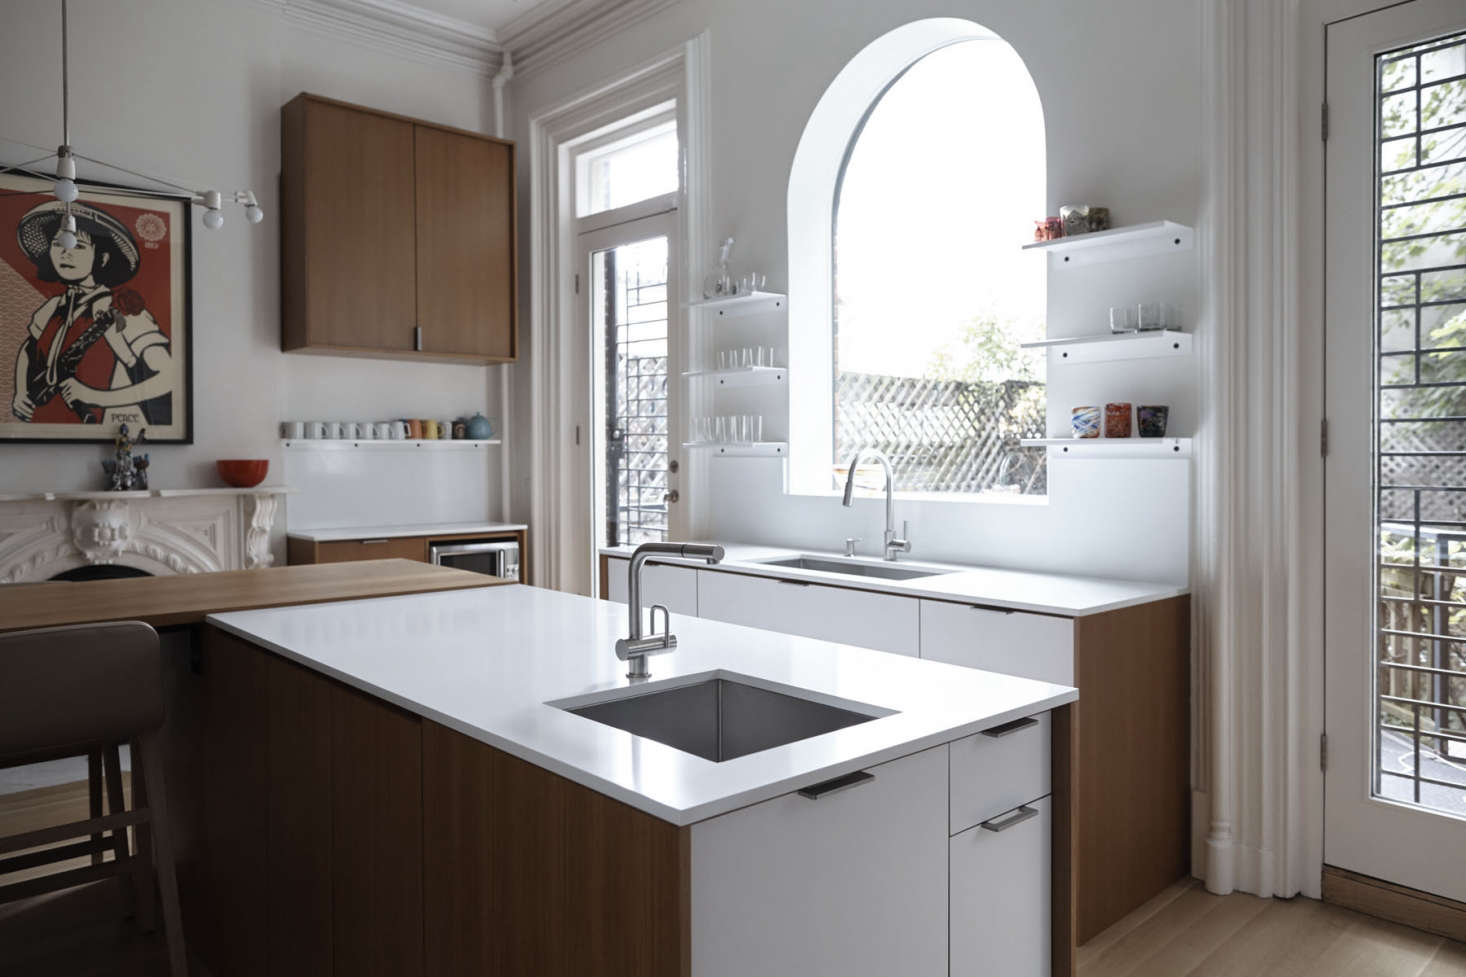 10 Genius Double Sinks, Utility Edition - Remodelista